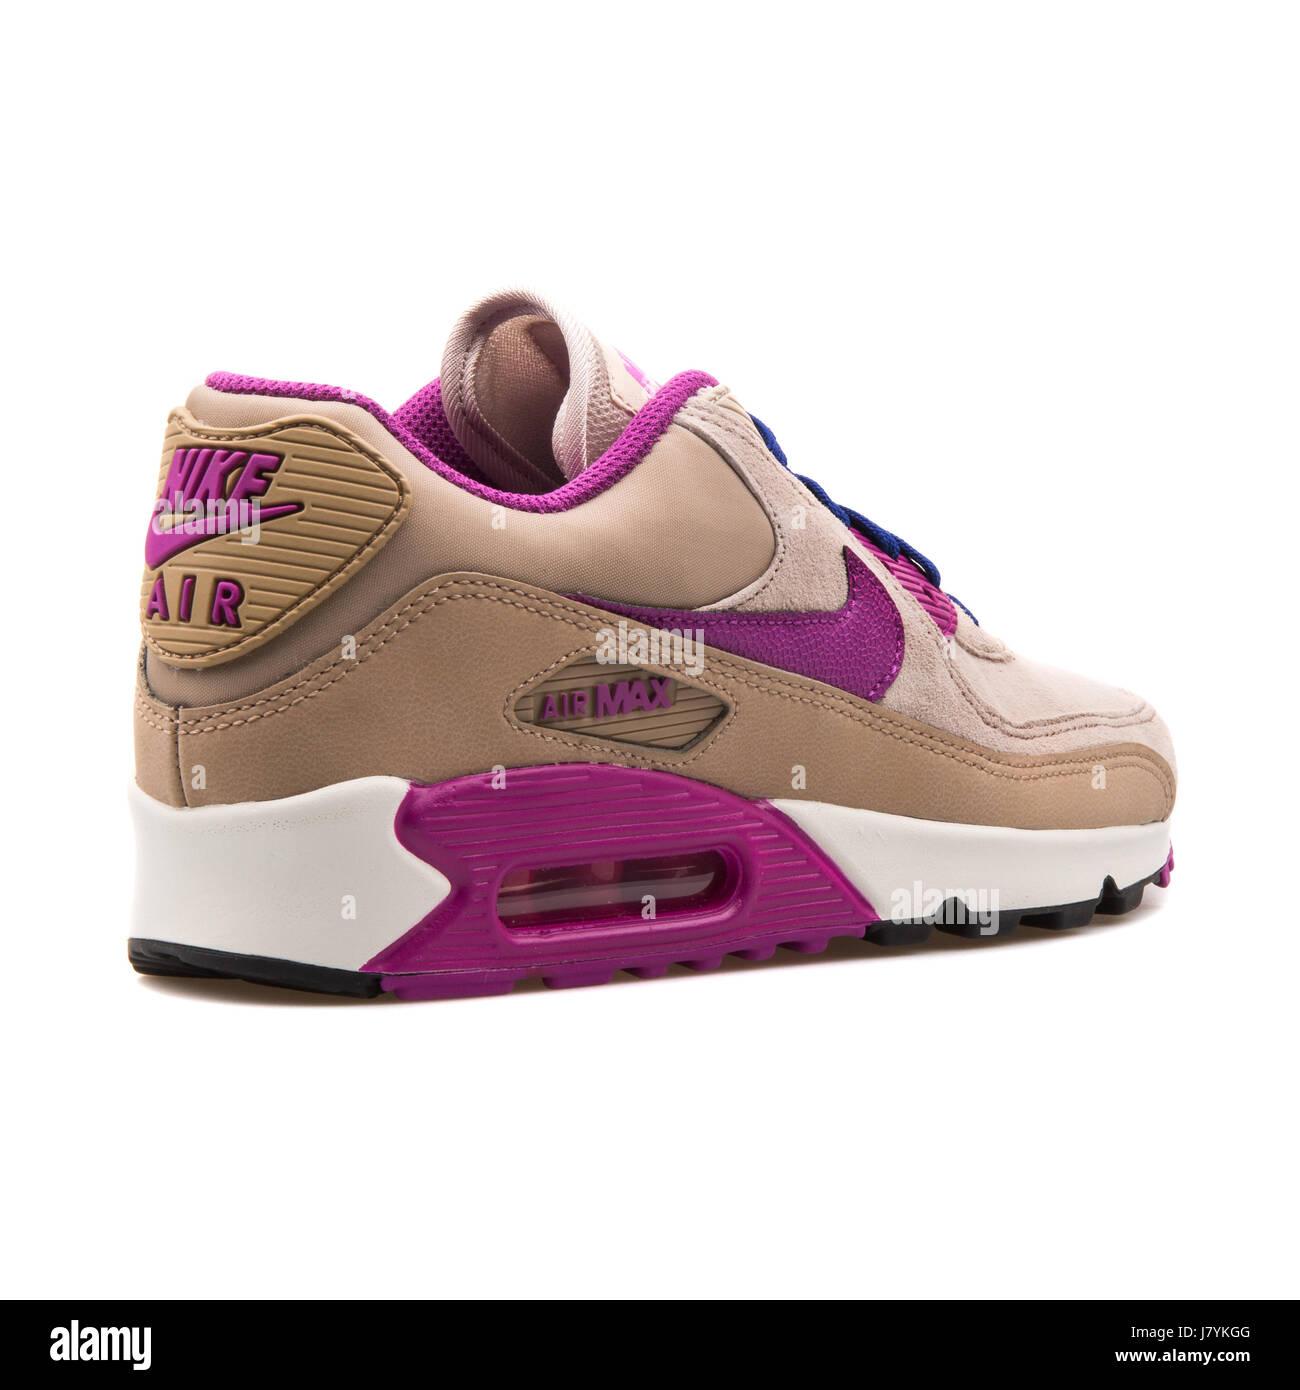 Nike WMNS Air Max 90 LTHR Women s Leather Running Desert Purple-Khaki  Sneakers - 768887-200 e60d61597f